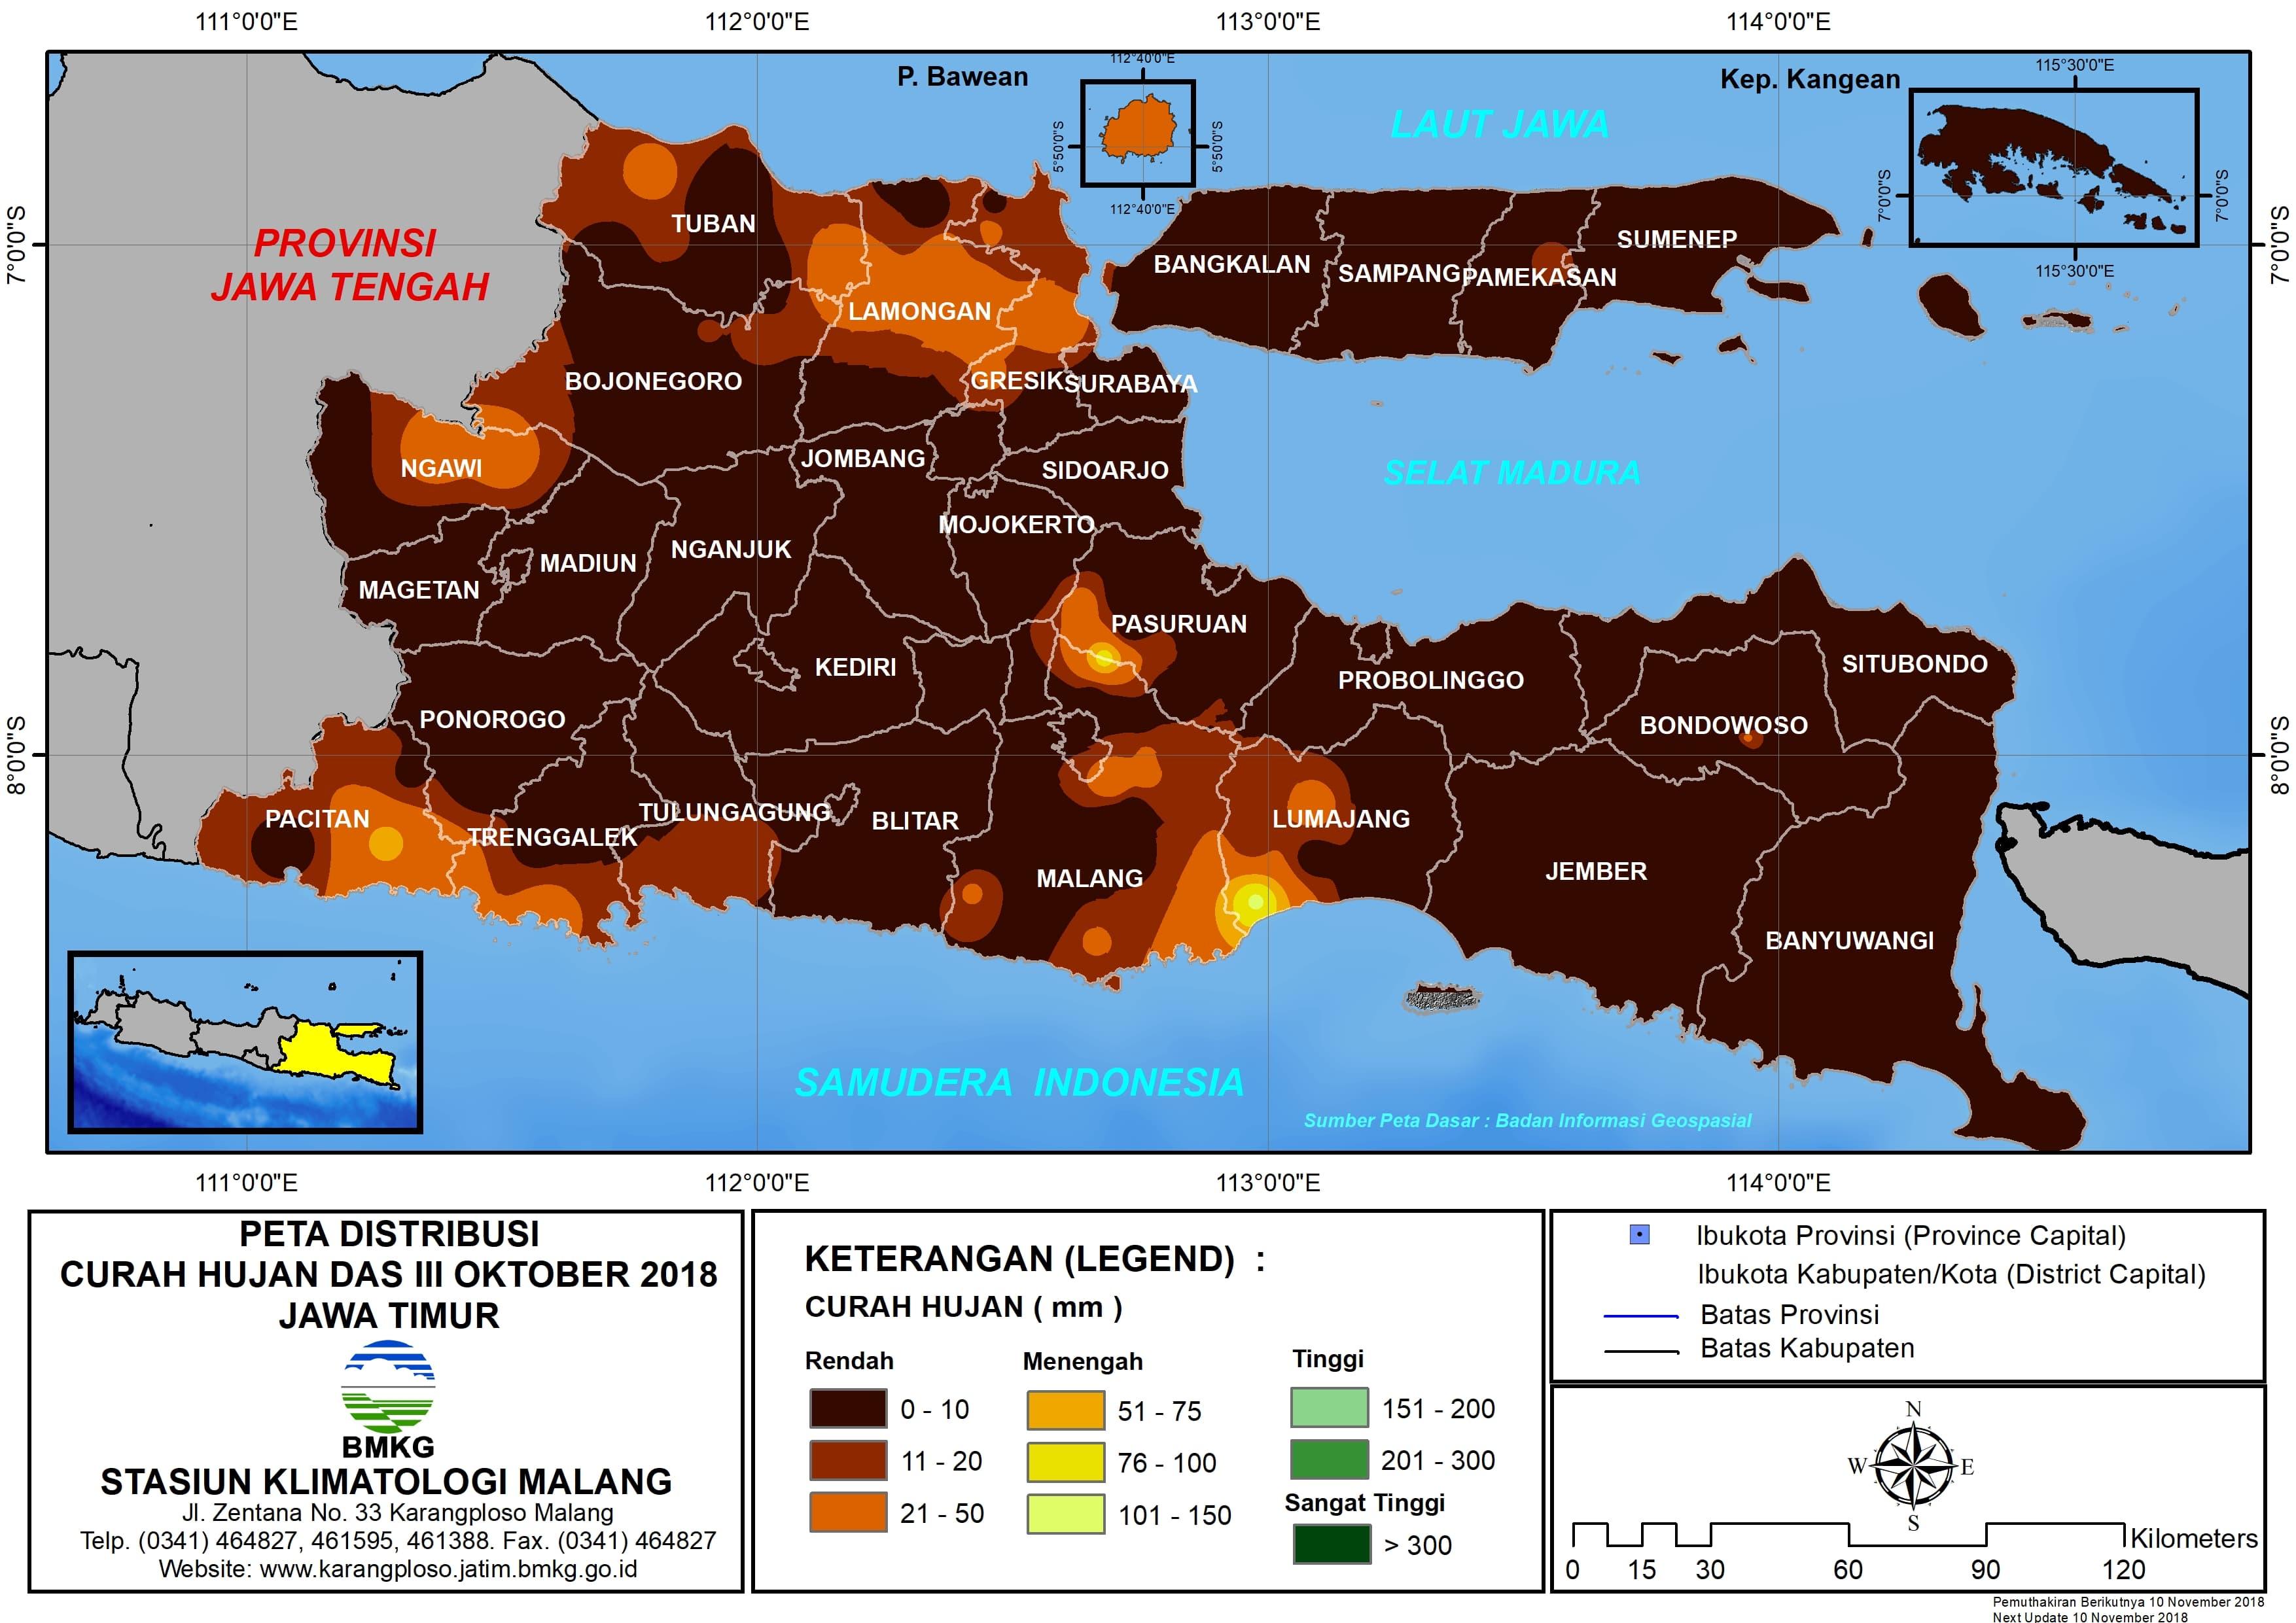 Analisis Distribusi Curah Hujan Dasarian III Oktober 2018 di Provinsi Jawa Timur